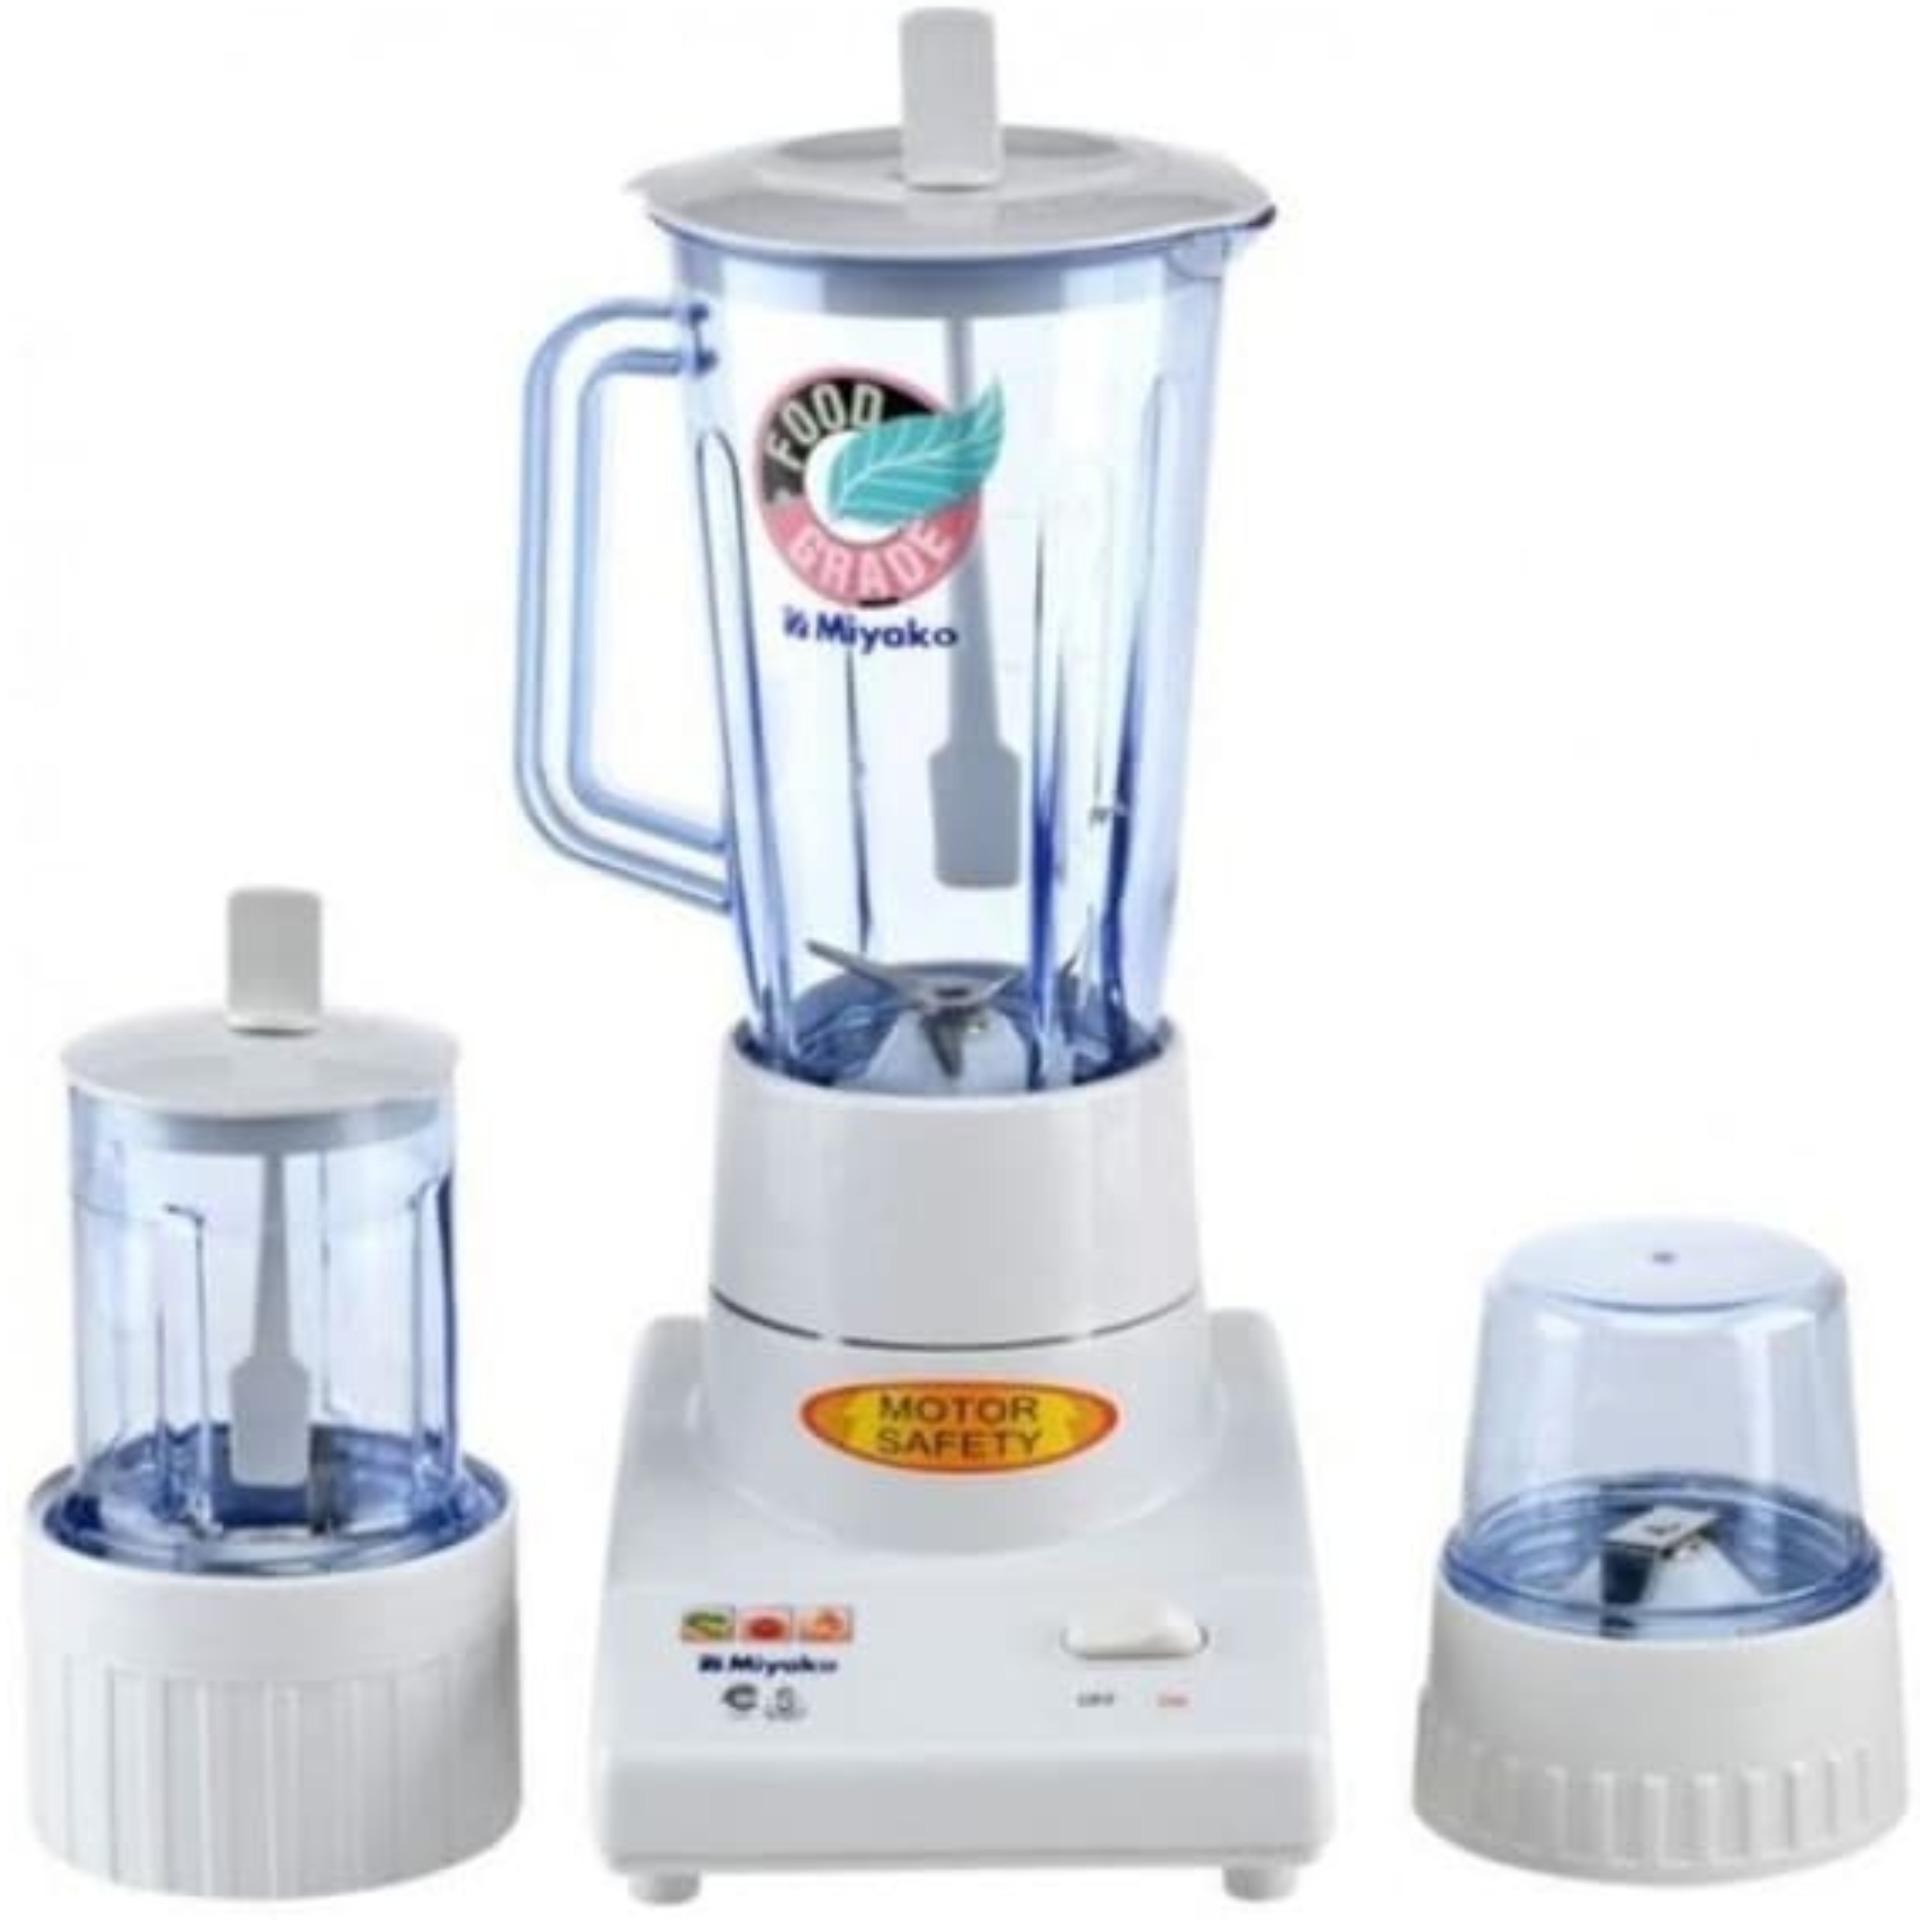 Miyako Blender Plastik 3 in 1 - BL102PL - GRATIS ONGKIR Jabodetabek